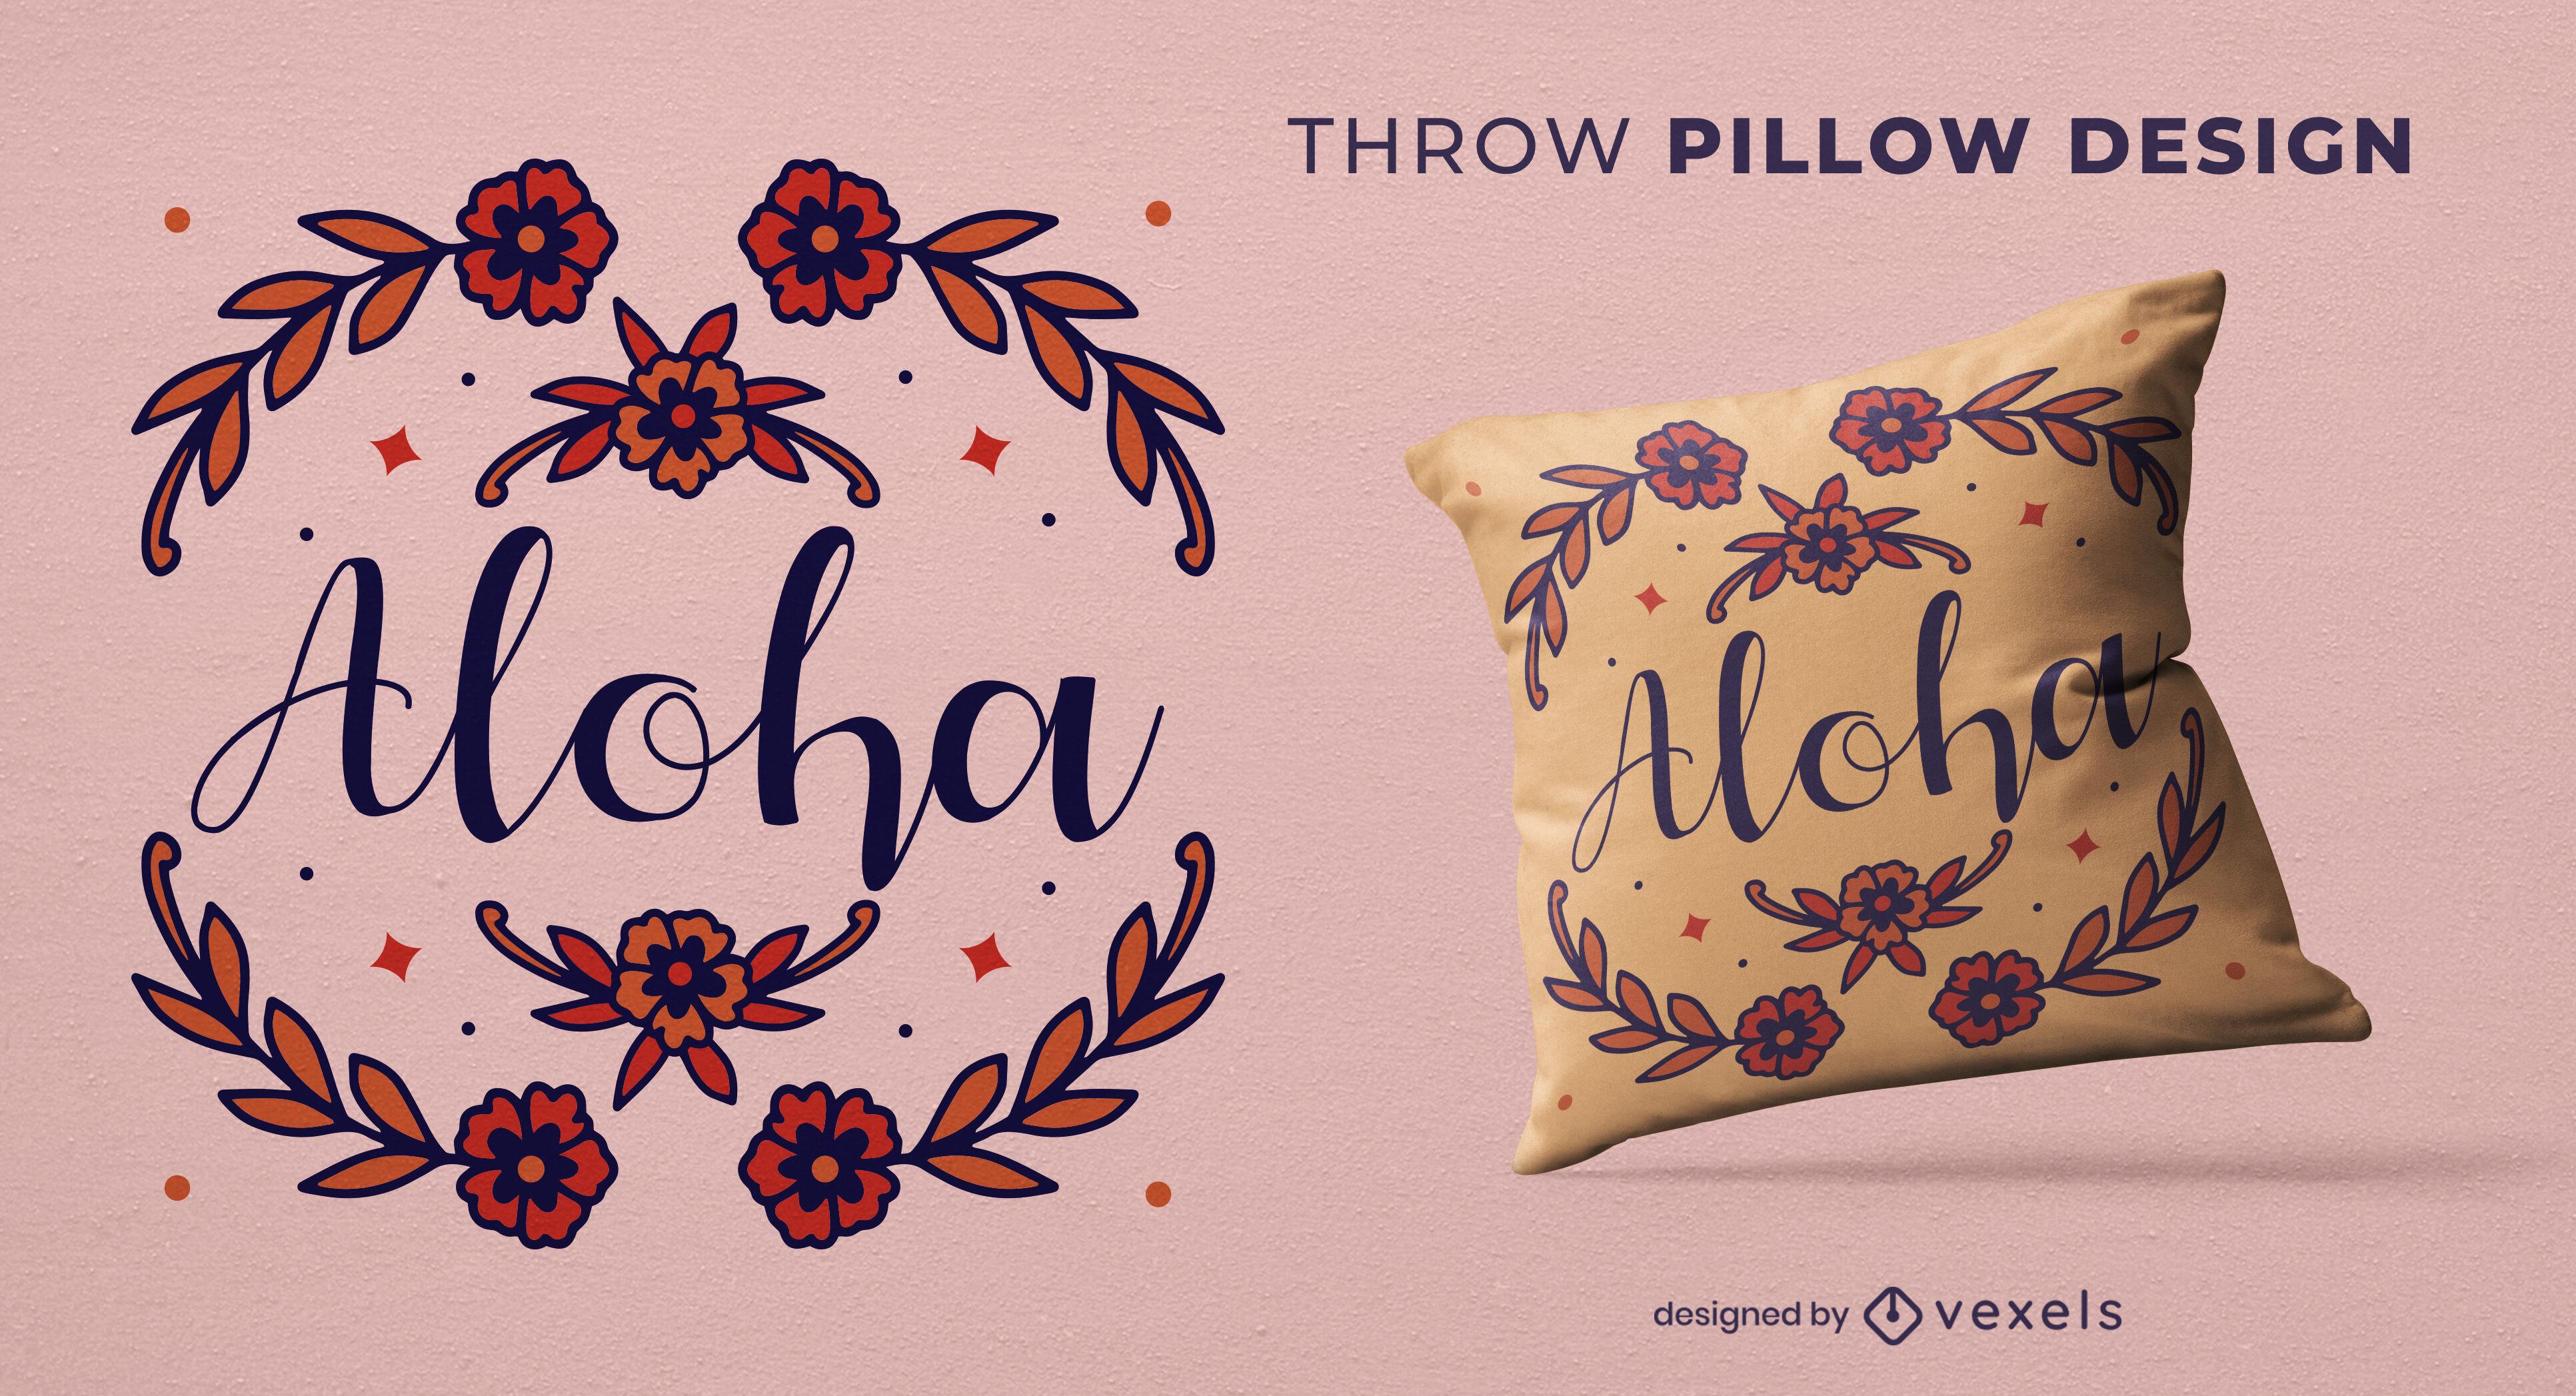 Aloha quote floral throw pillow design